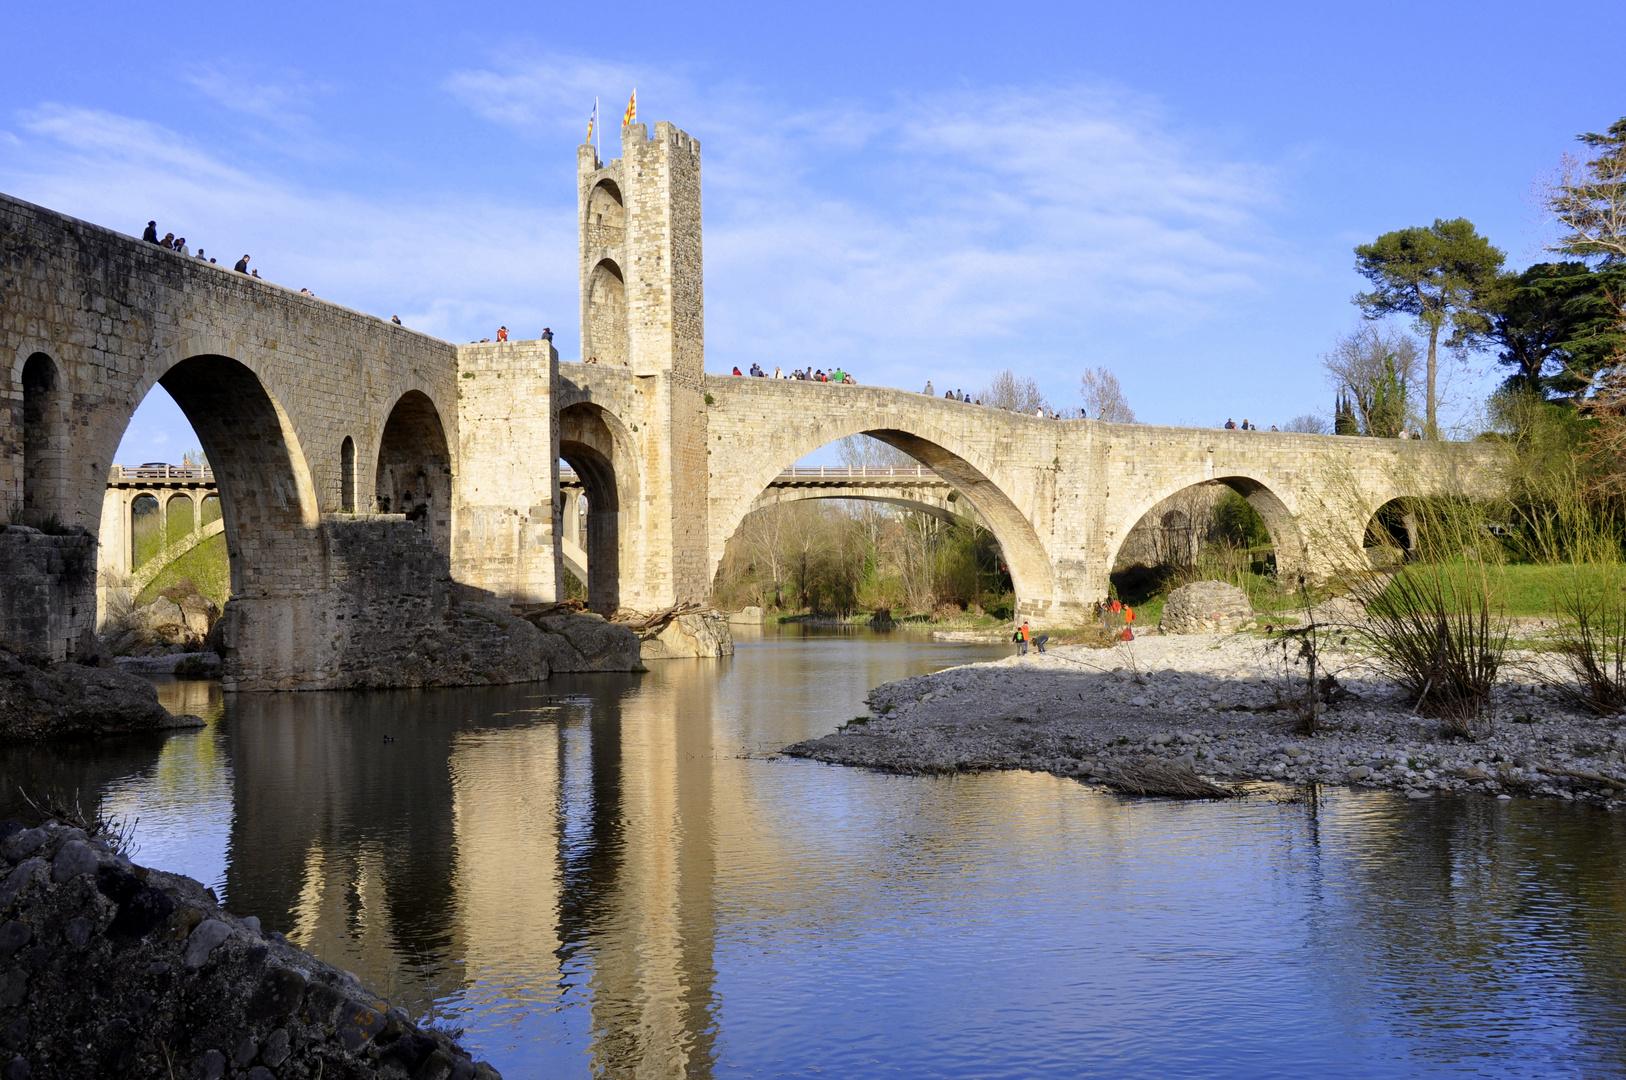 Alte Brücke von Besalú (Girona)